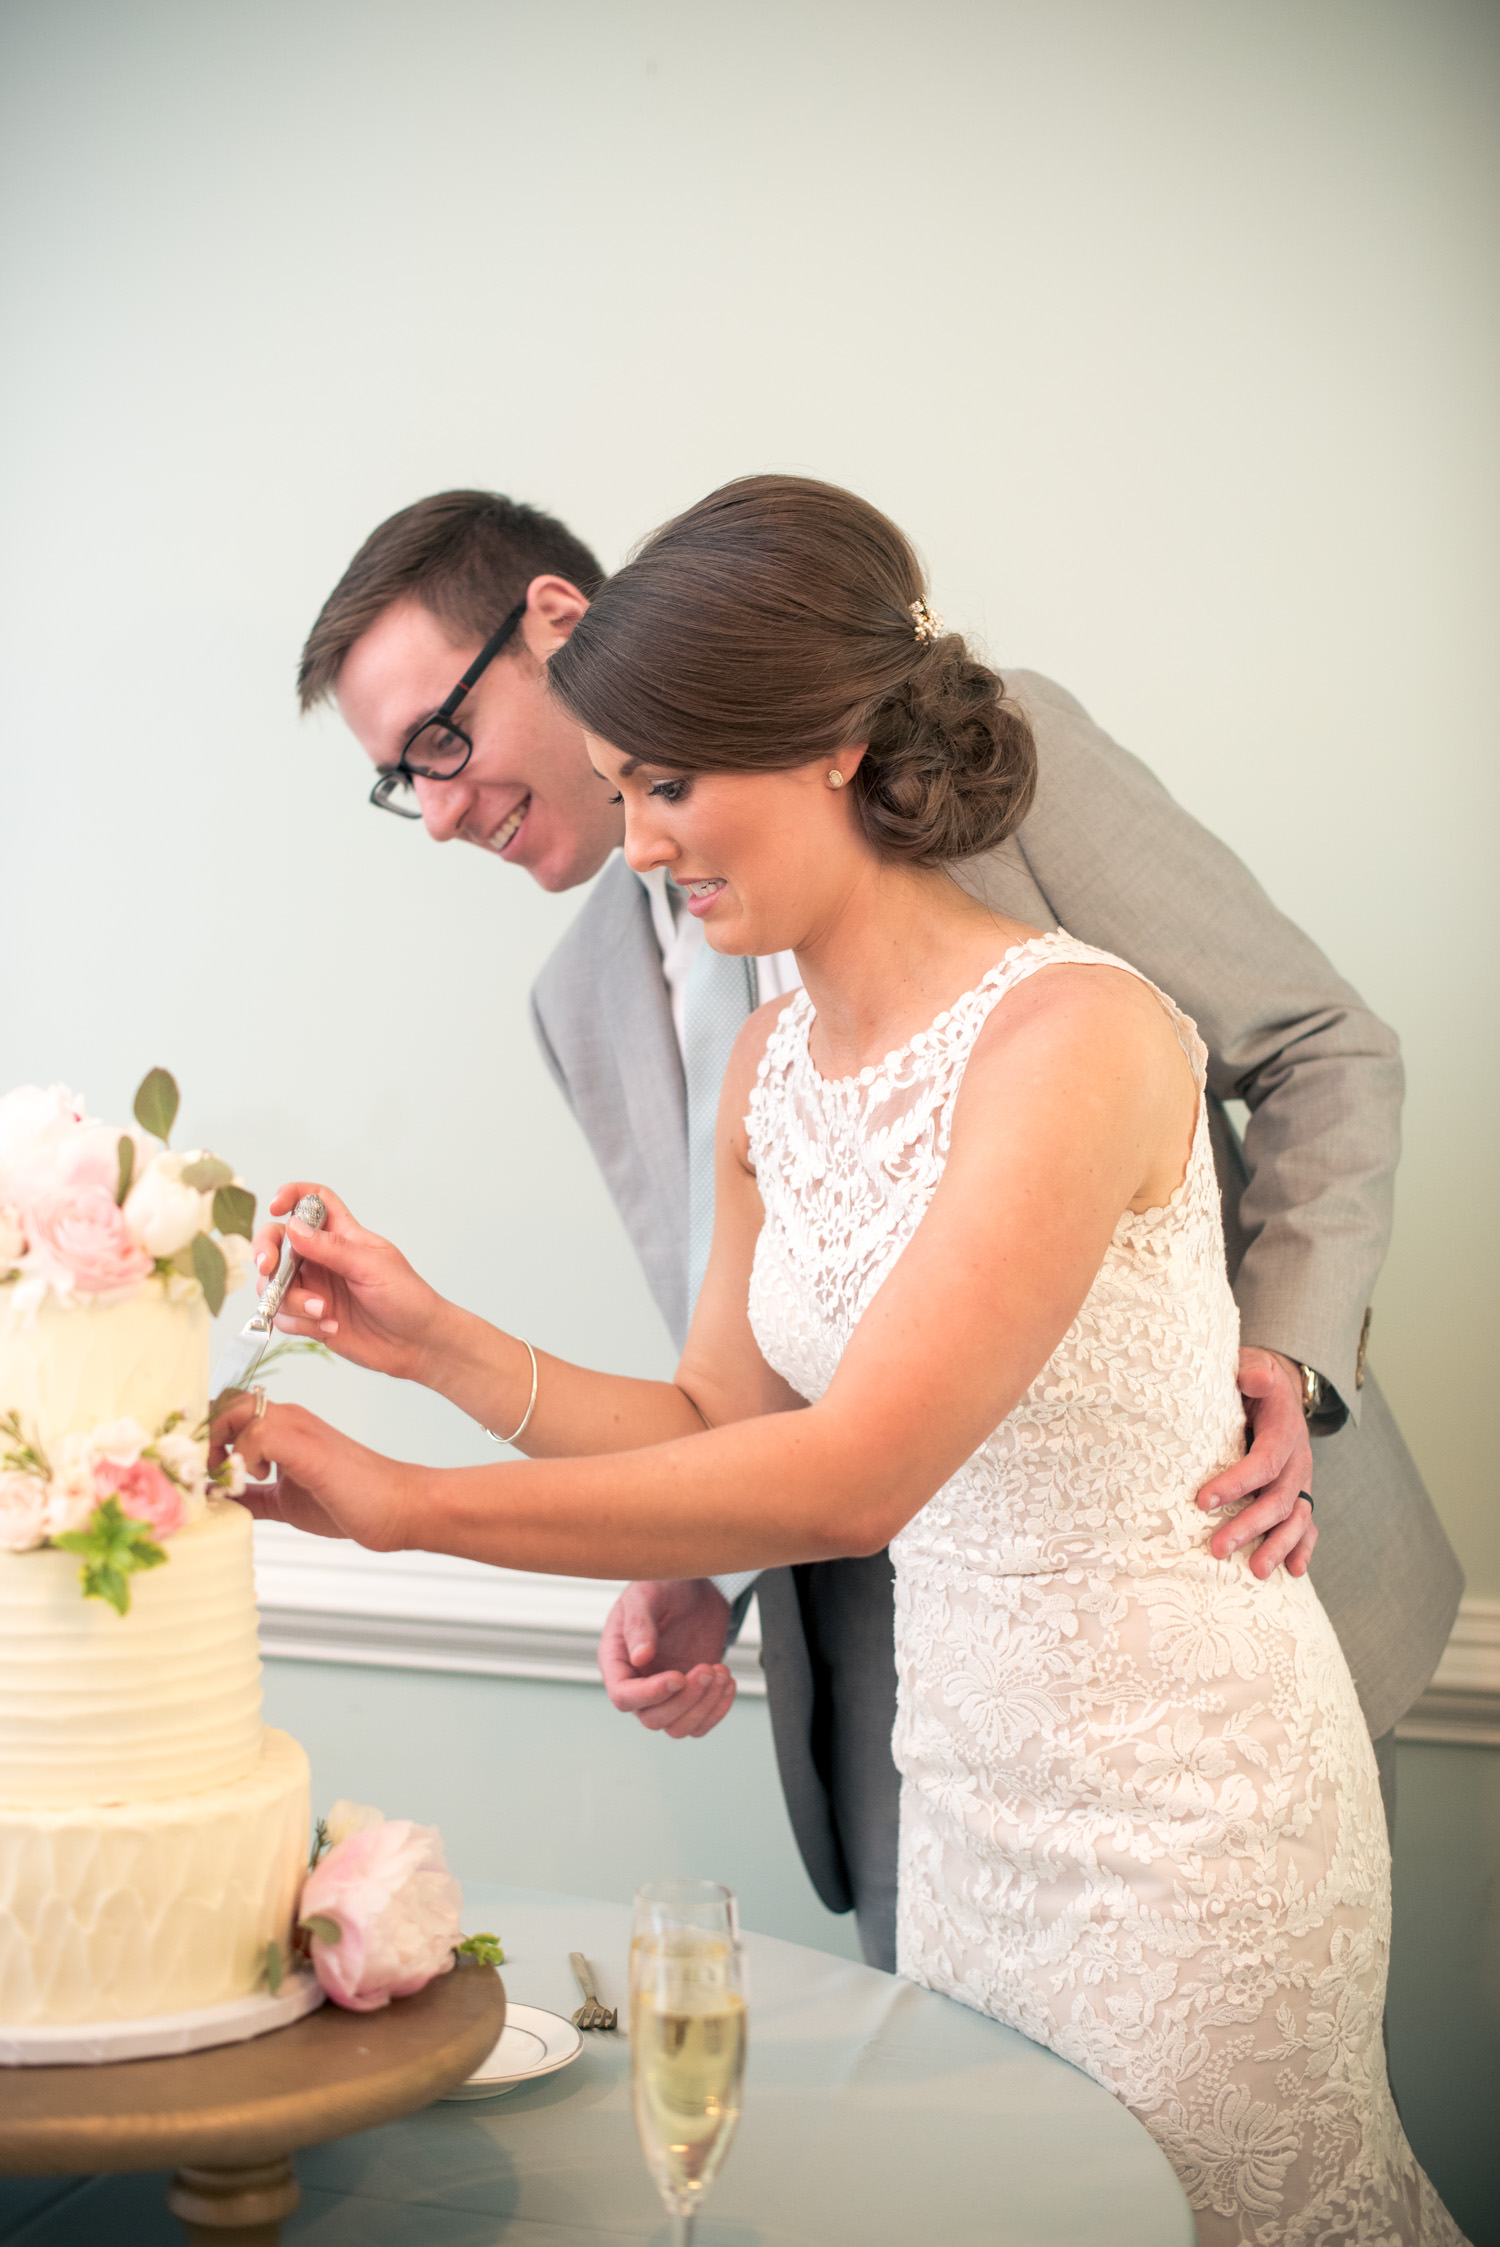 paulos-wedding-preview-64.jpg